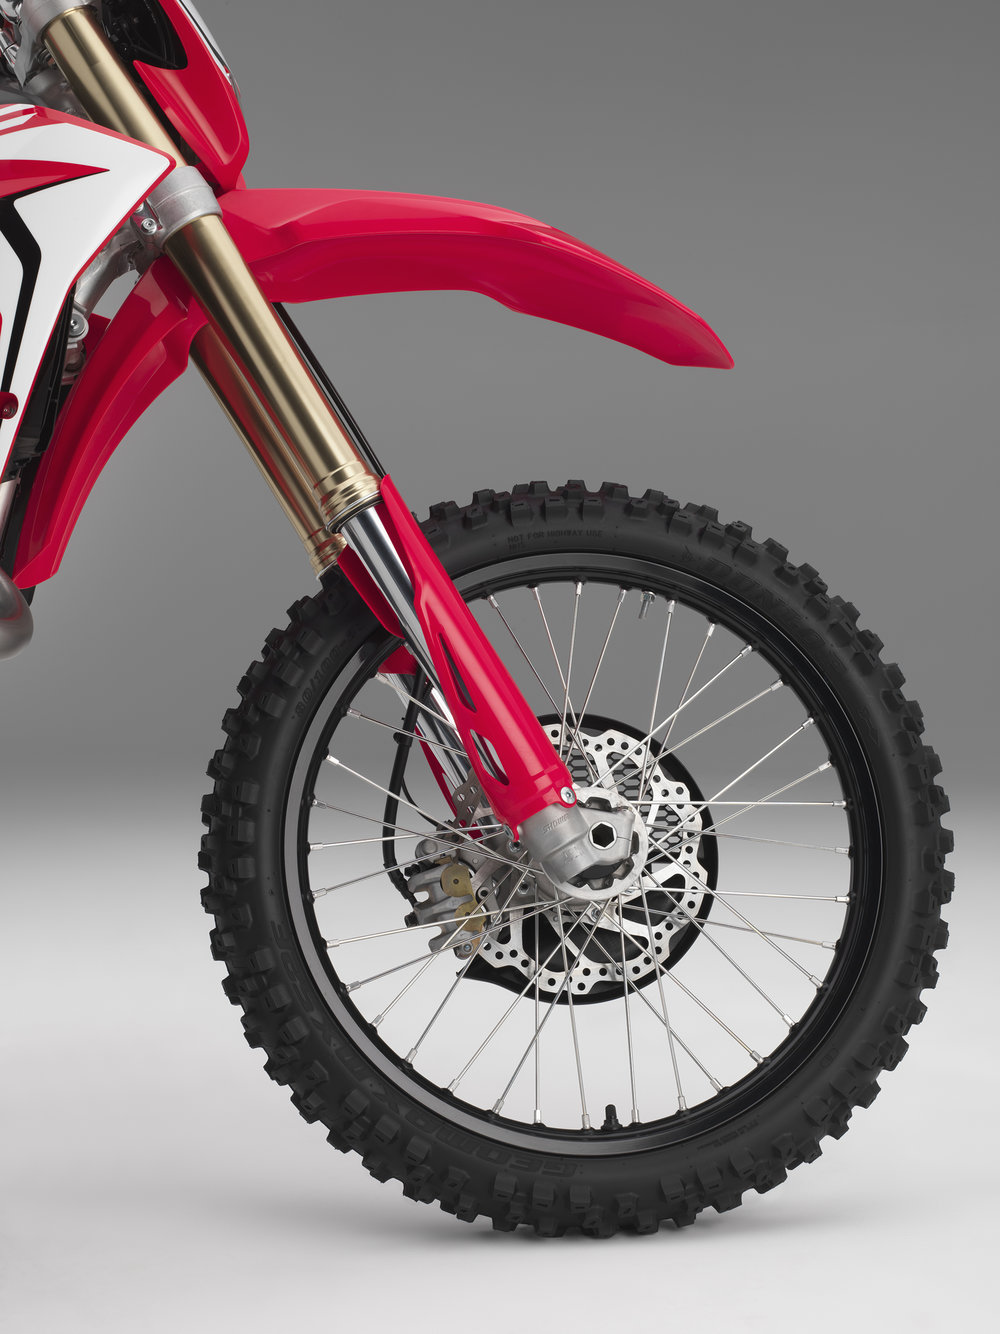 19 Honda CRF450X_front wheel.jpg